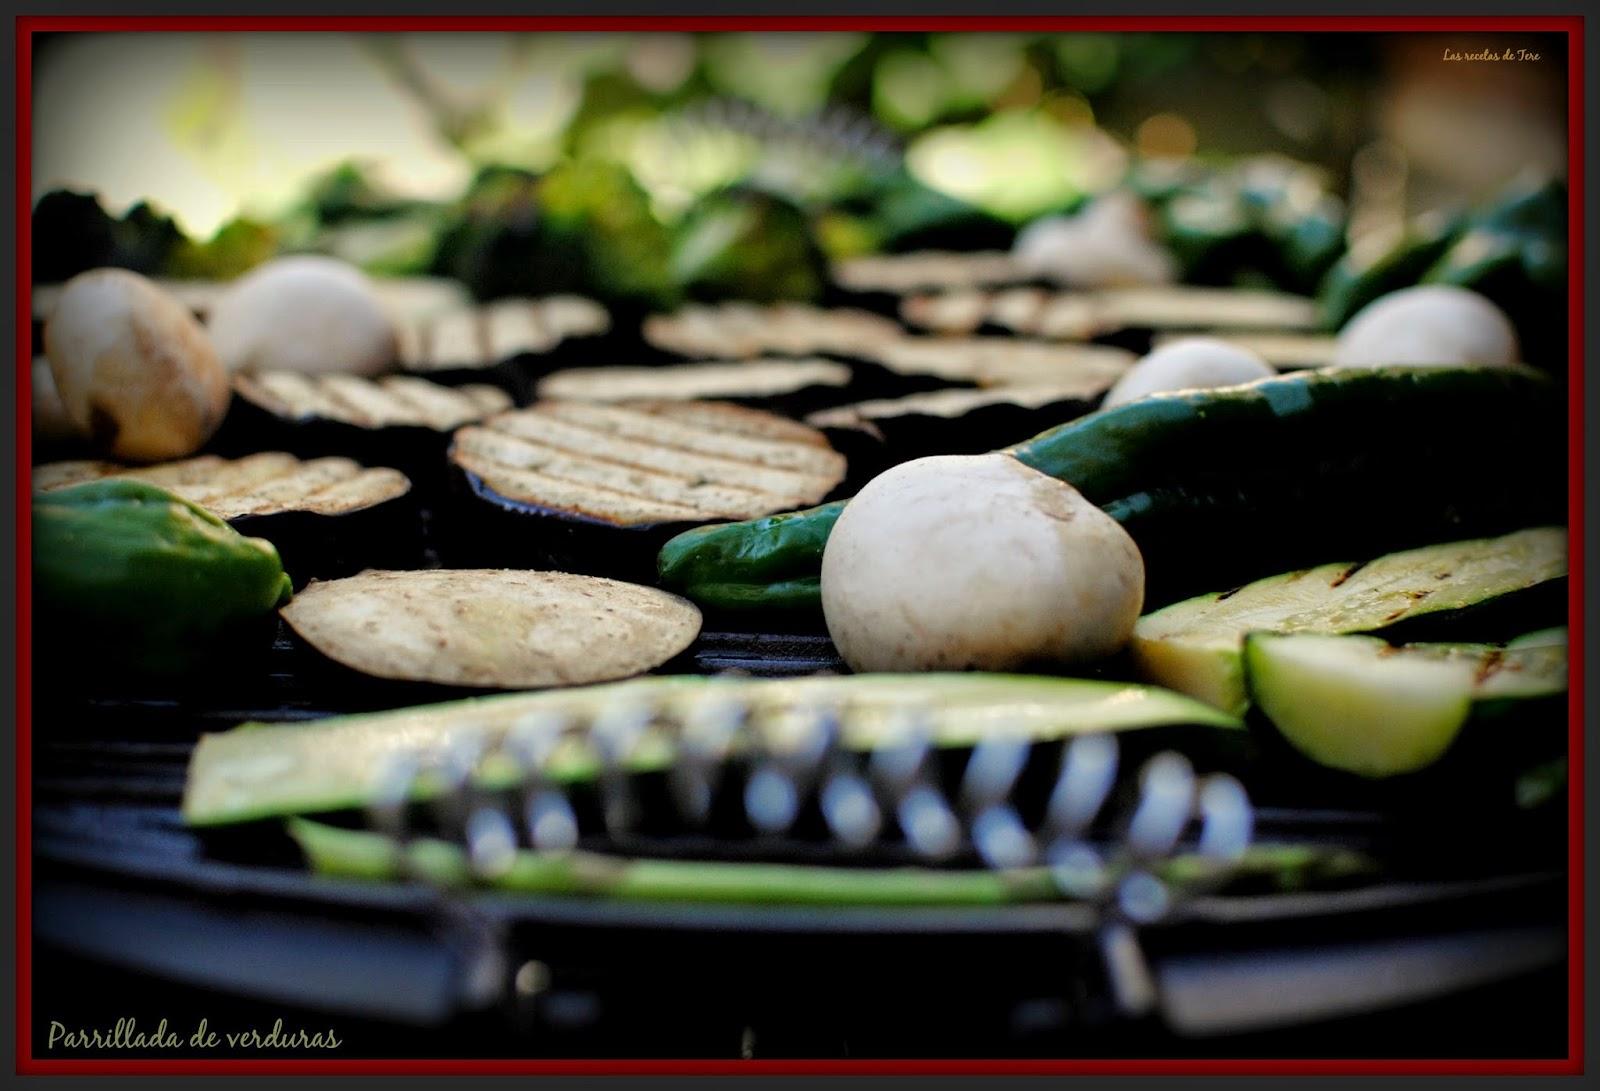 parrillada de verduras tererecetas 03